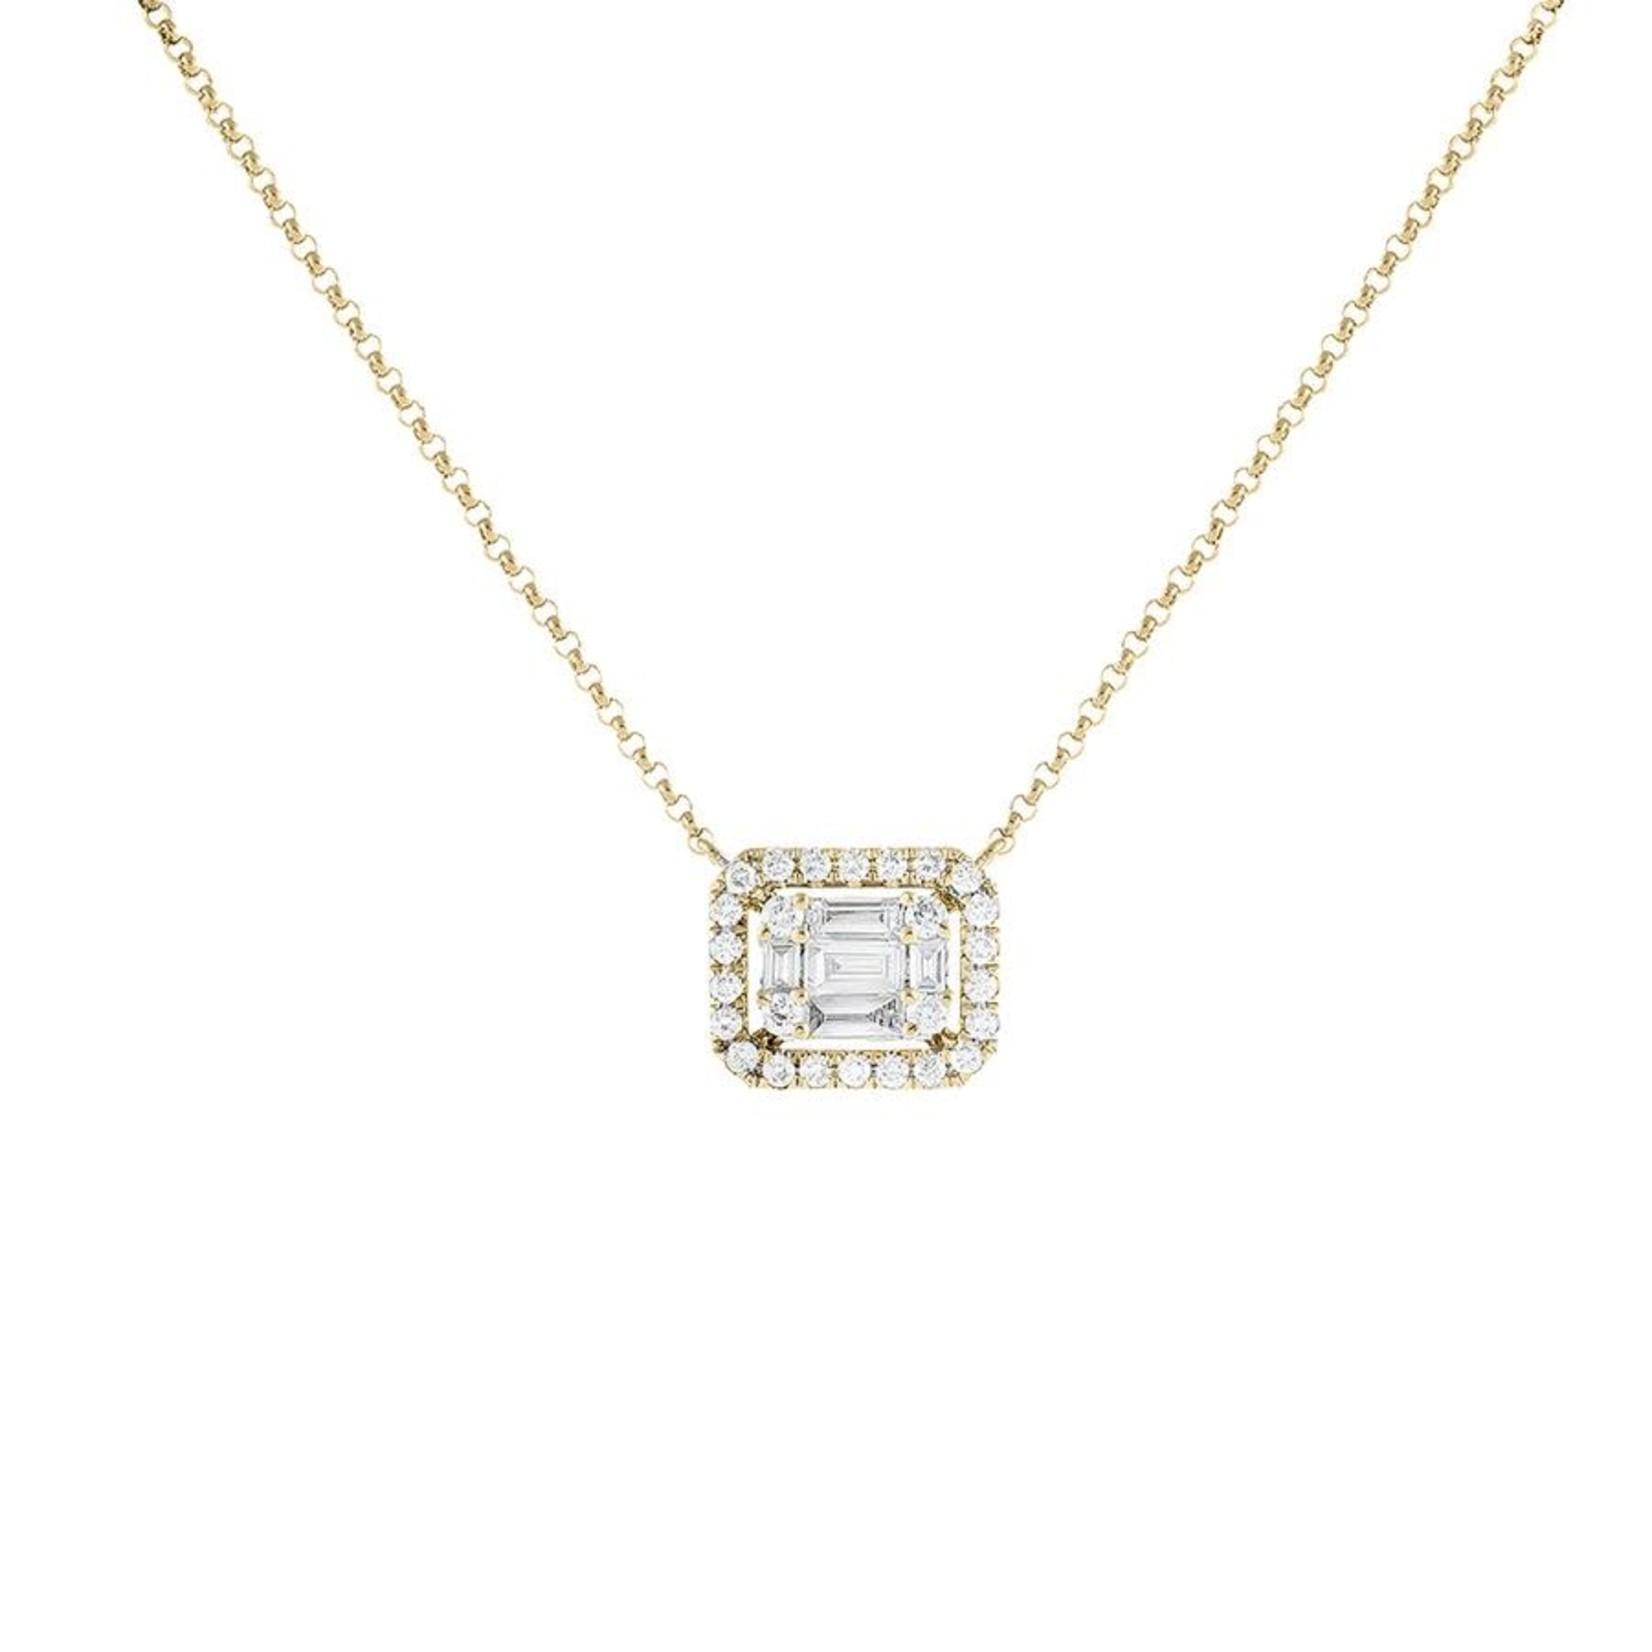 Adinas Diamond Illusion Sideways Baguette Pendant Necklace 14K